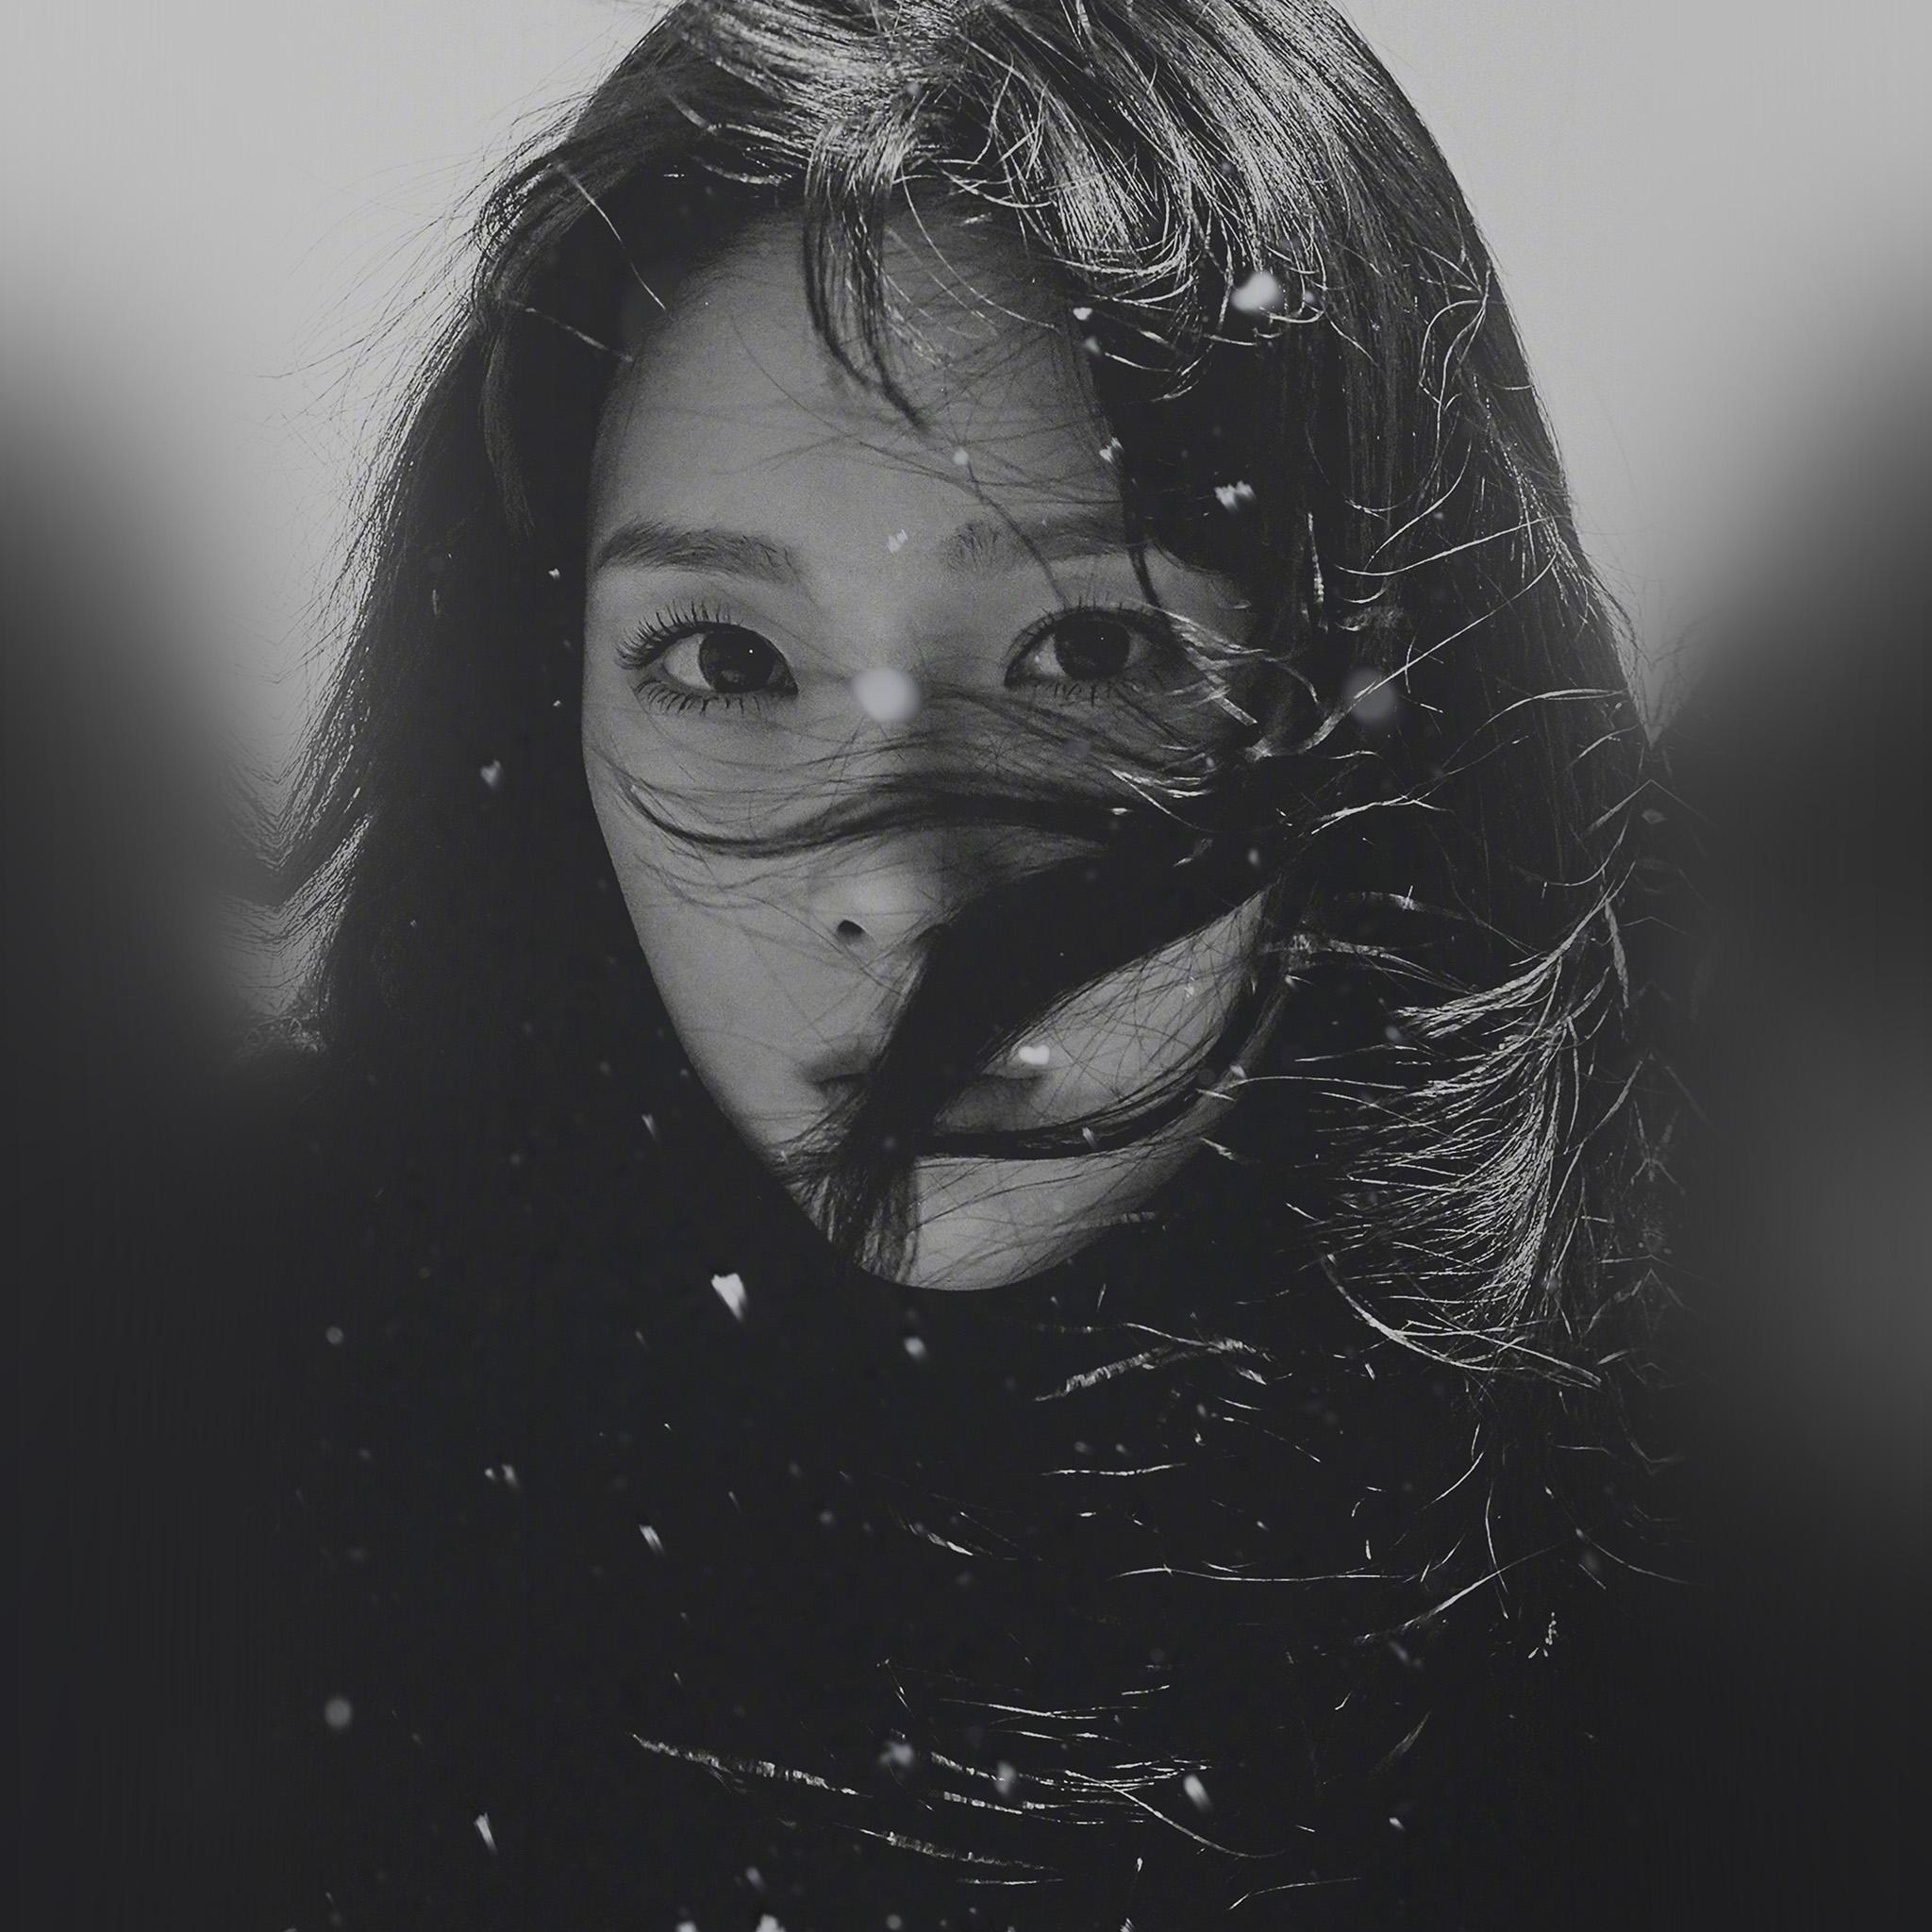 Kpop Girl Wallpaper Laptop Ho96 Kpop Taeyeon Girl Bw Dark Snsd Wallpaper